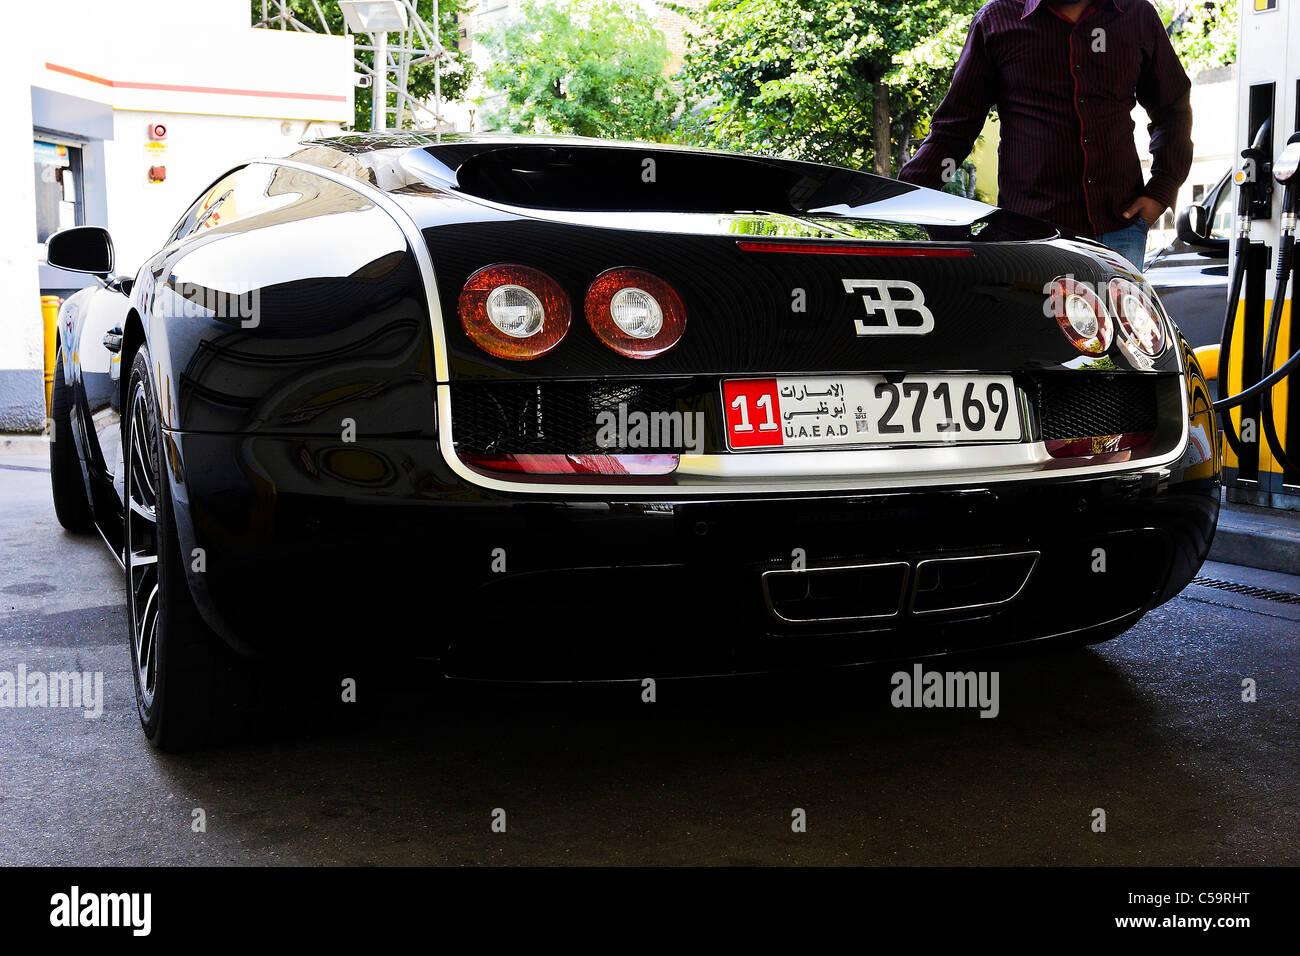 Supercars Rear View Stock Photos Supercars Rear View Stock